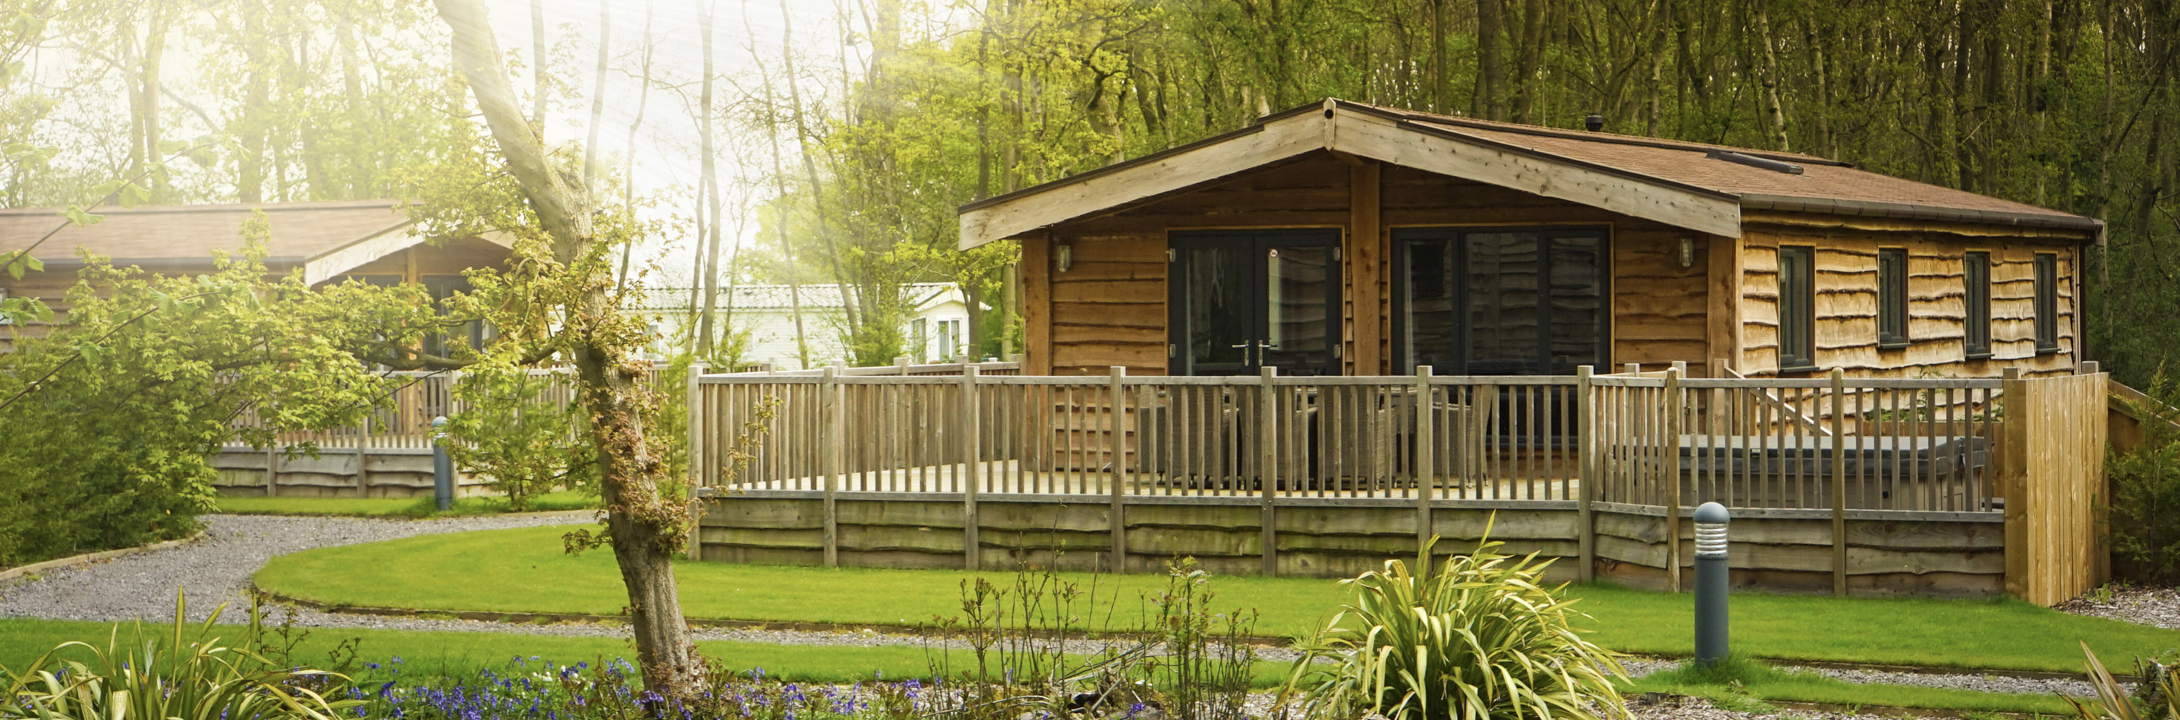 woodthorpe lodge summer 2180 x 720